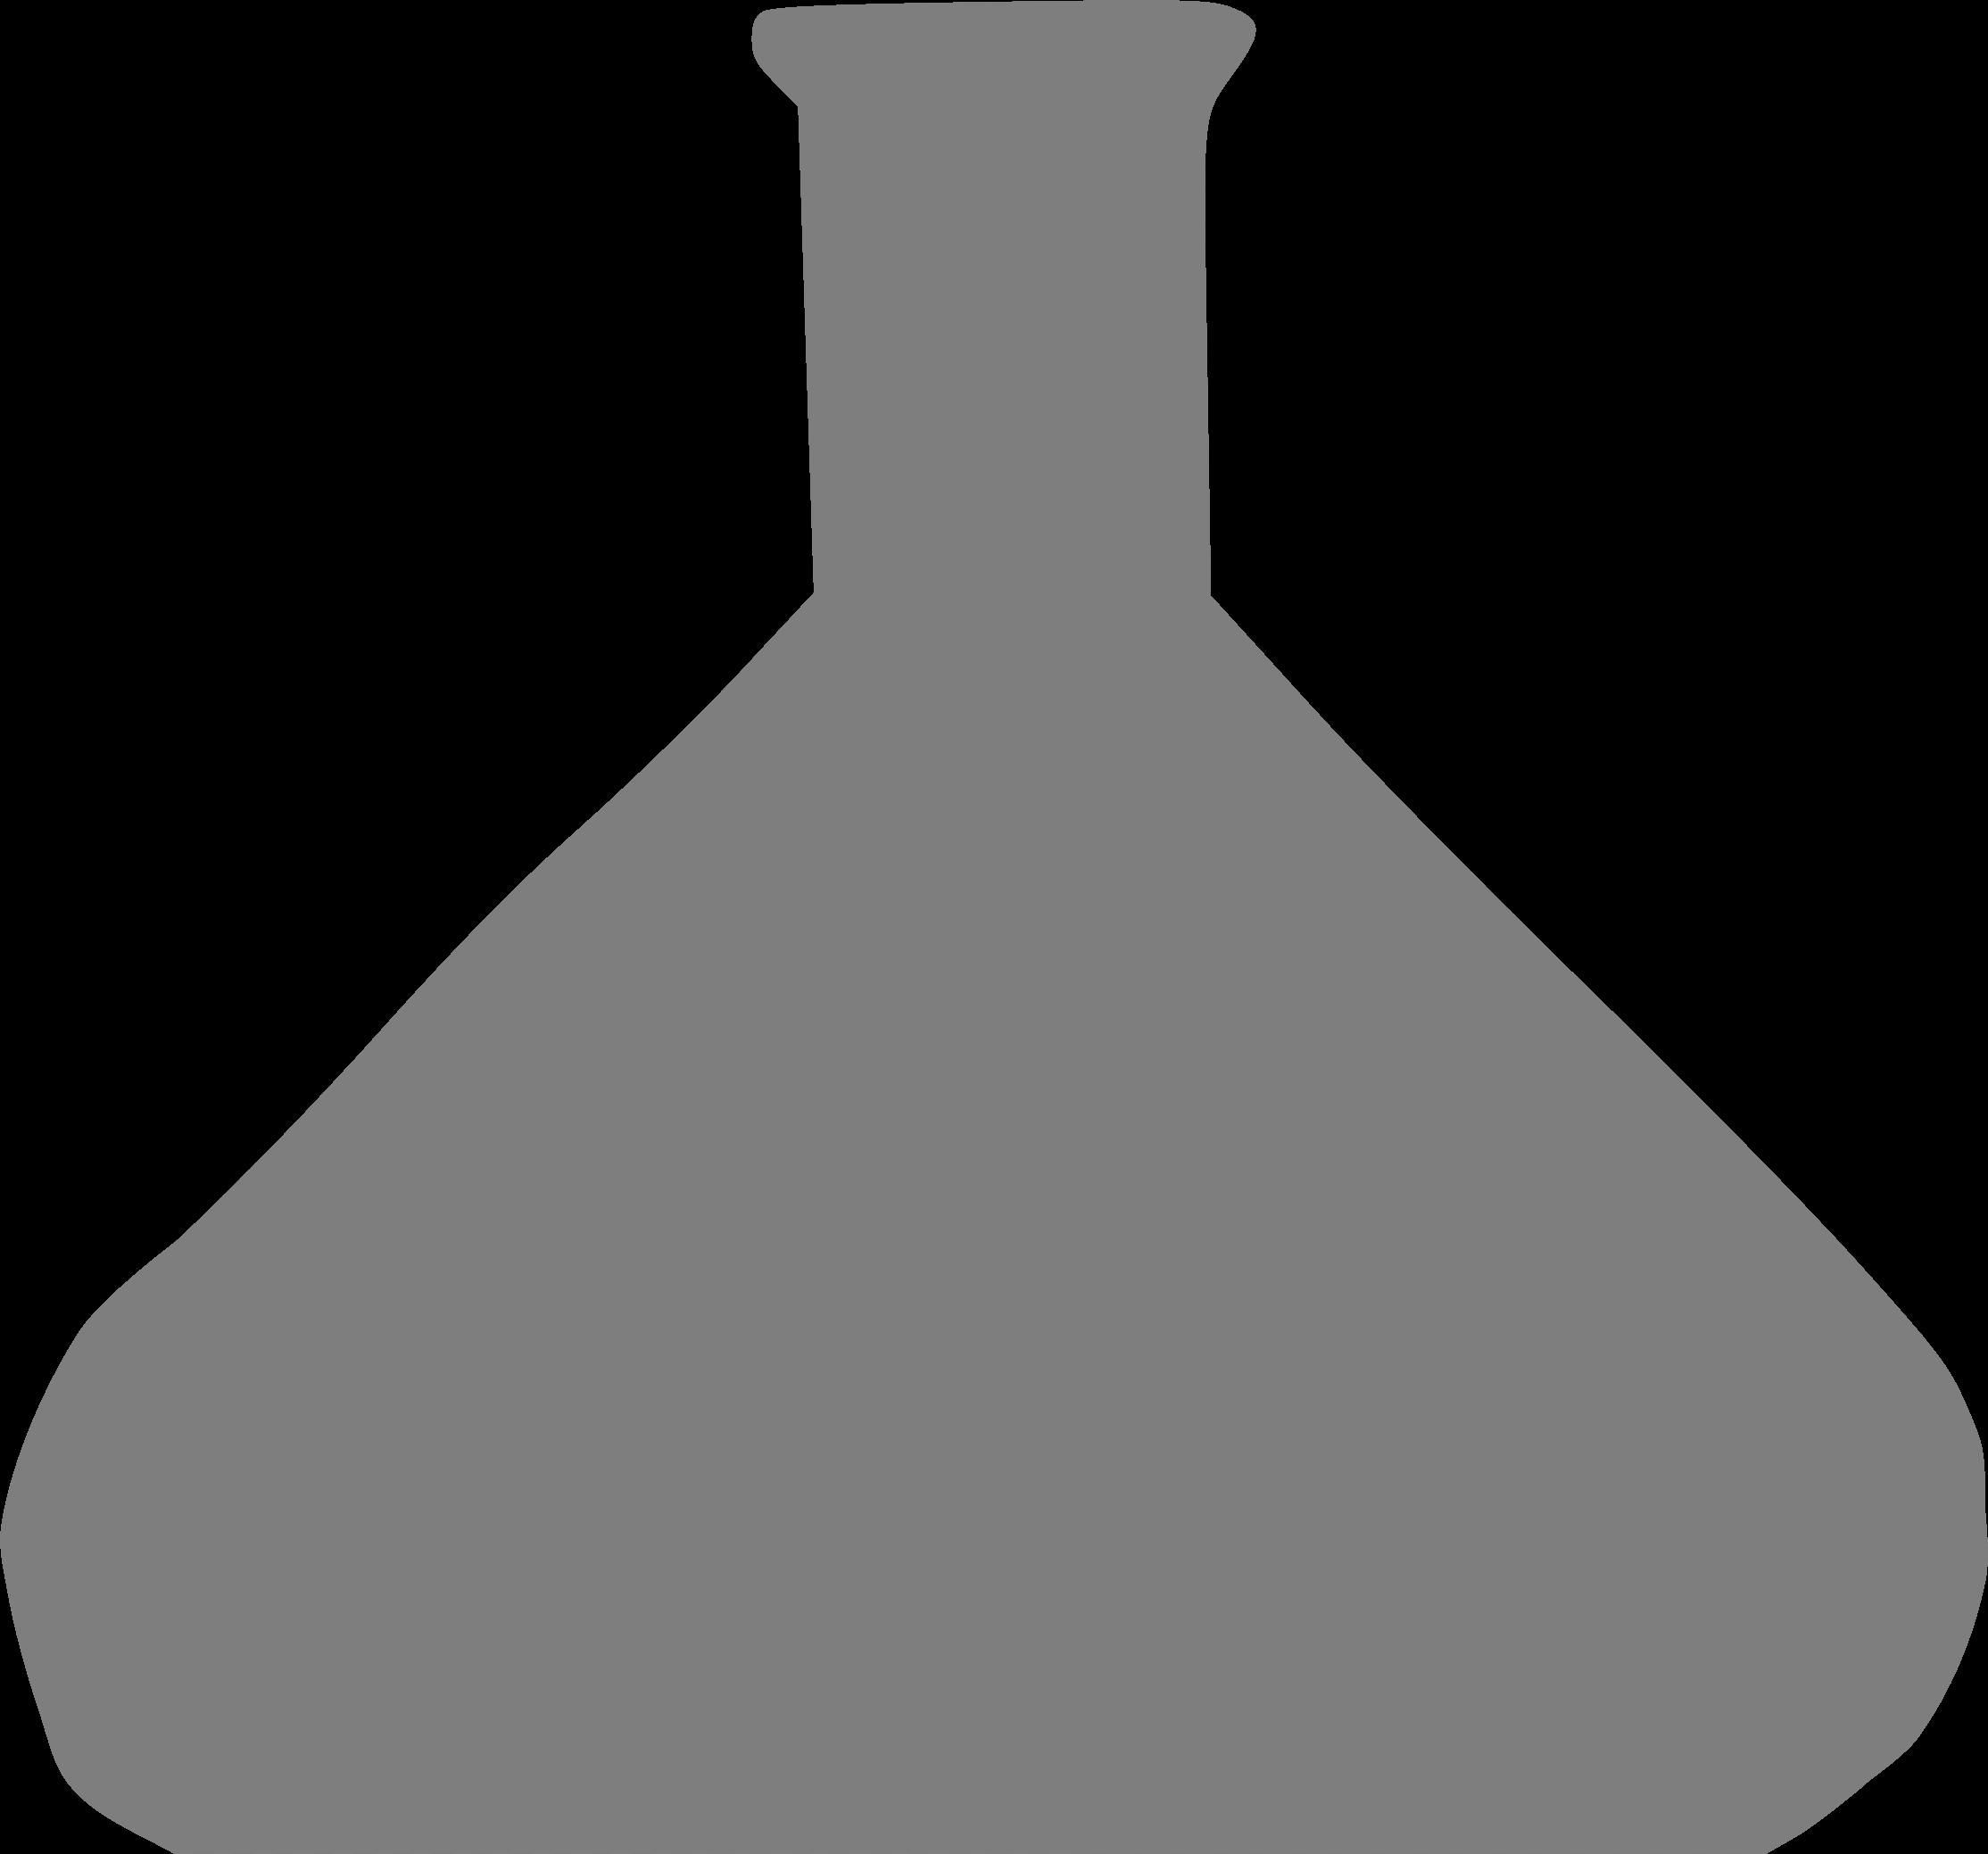 2228x2078 Beaker Graphic Vector Clipart Image